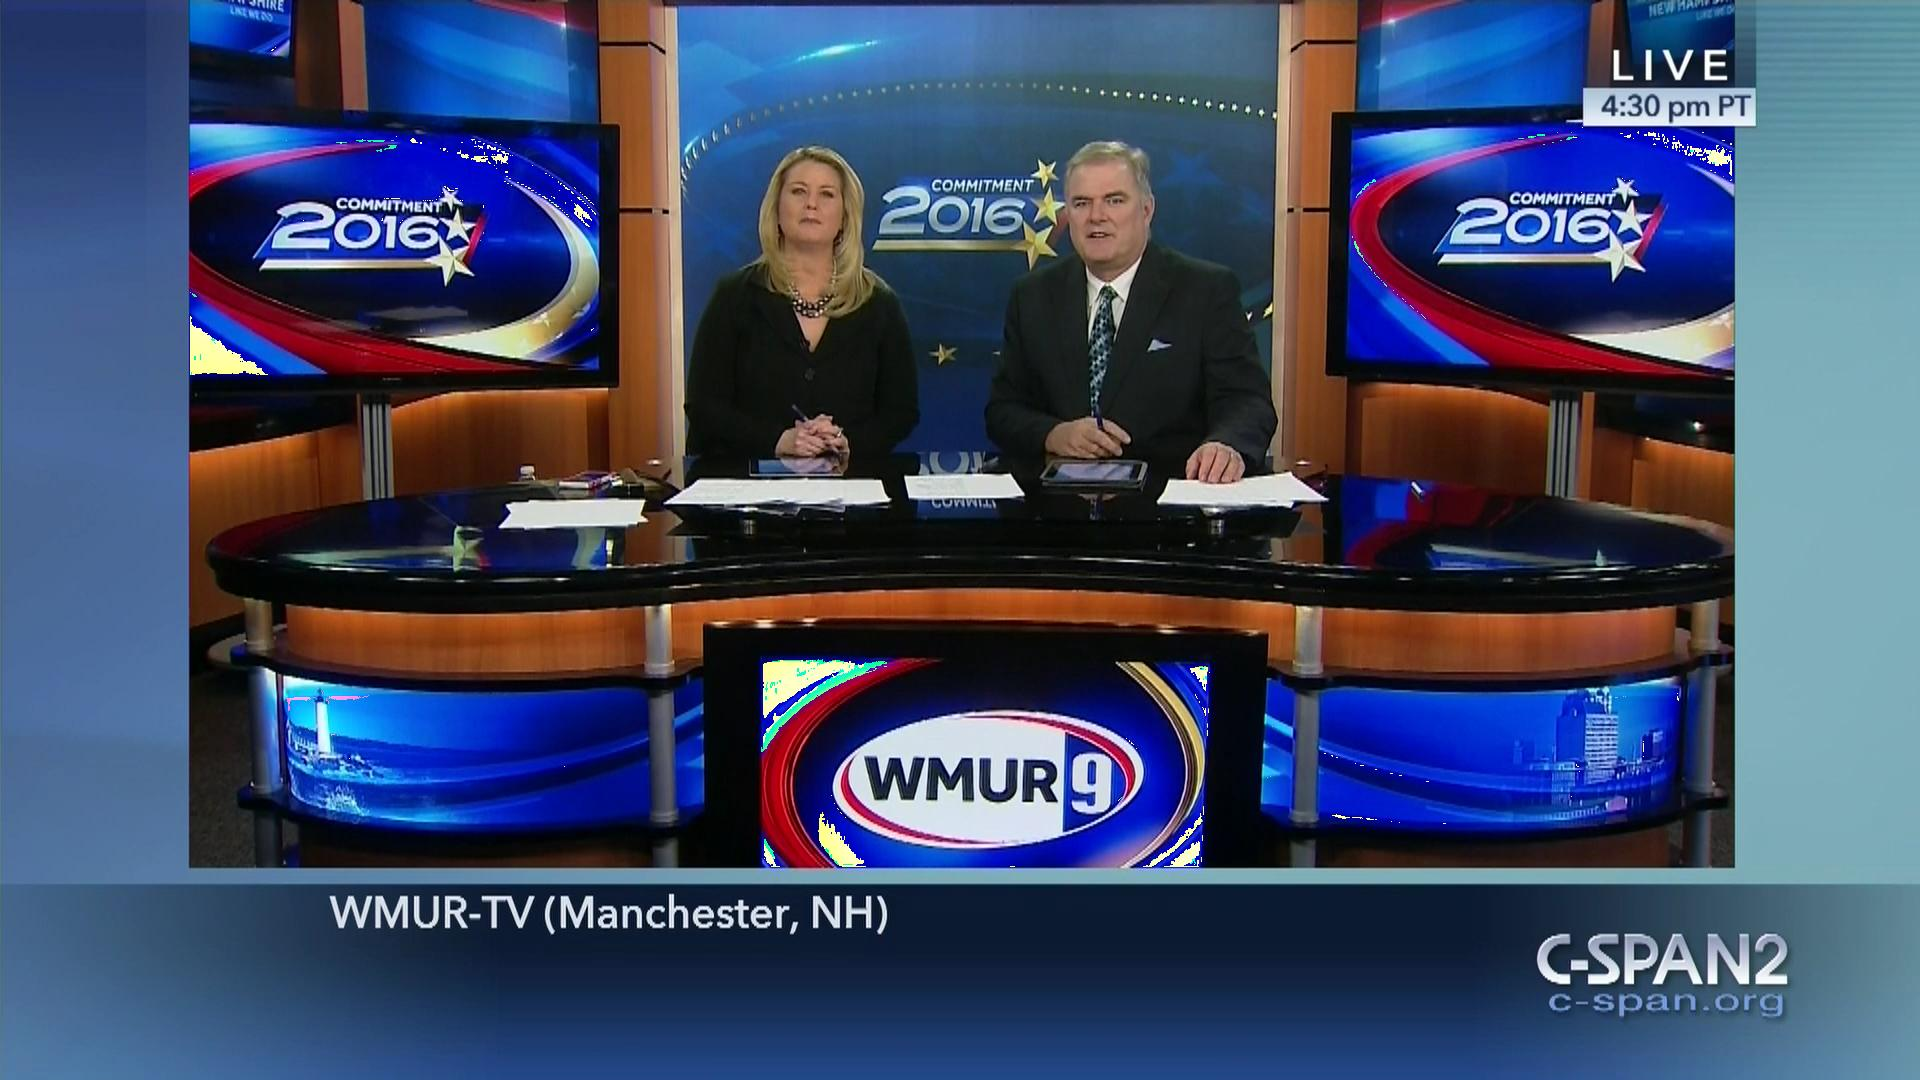 WMUR-TV New Hampshire Primary Coverage